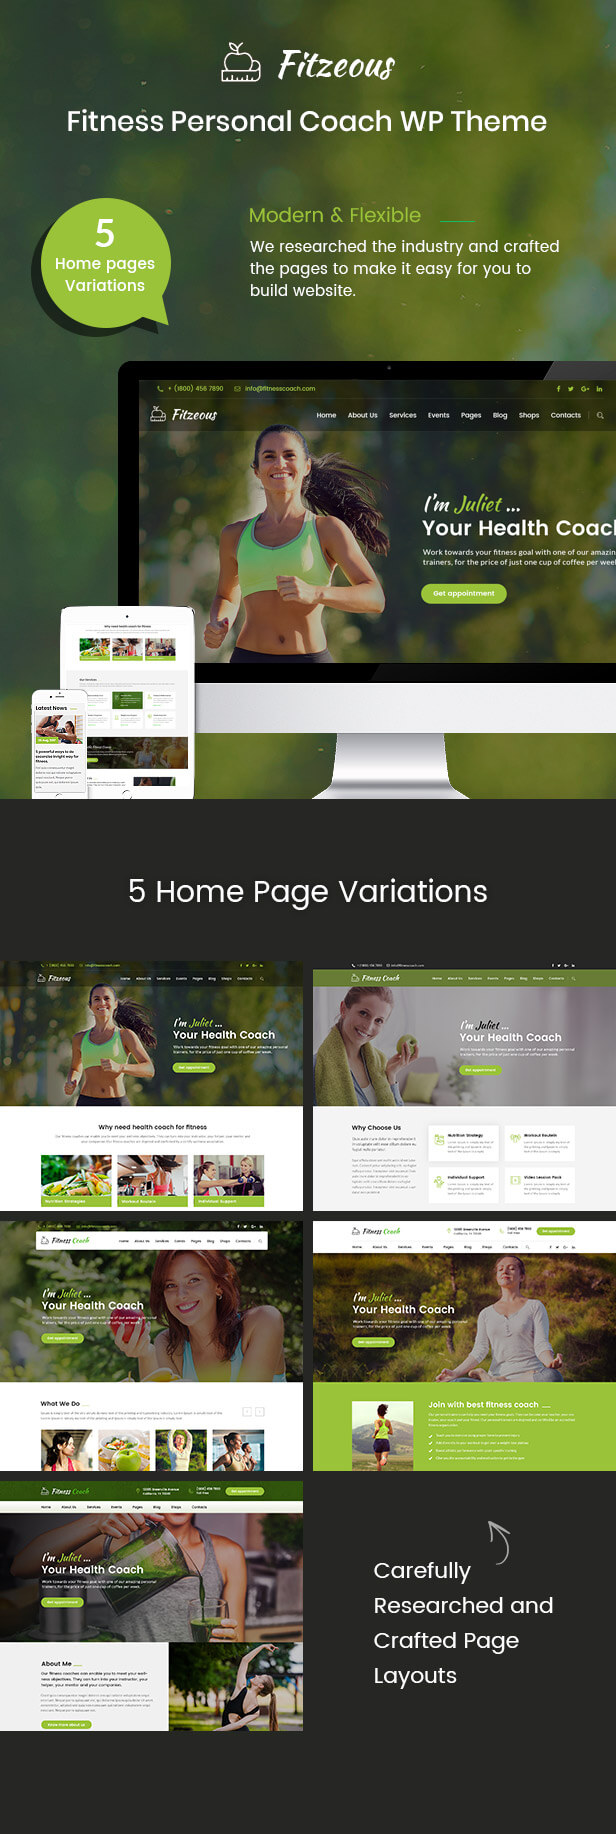 Fitzeous - Personal Fitness Trainer WordPress Theme - 2